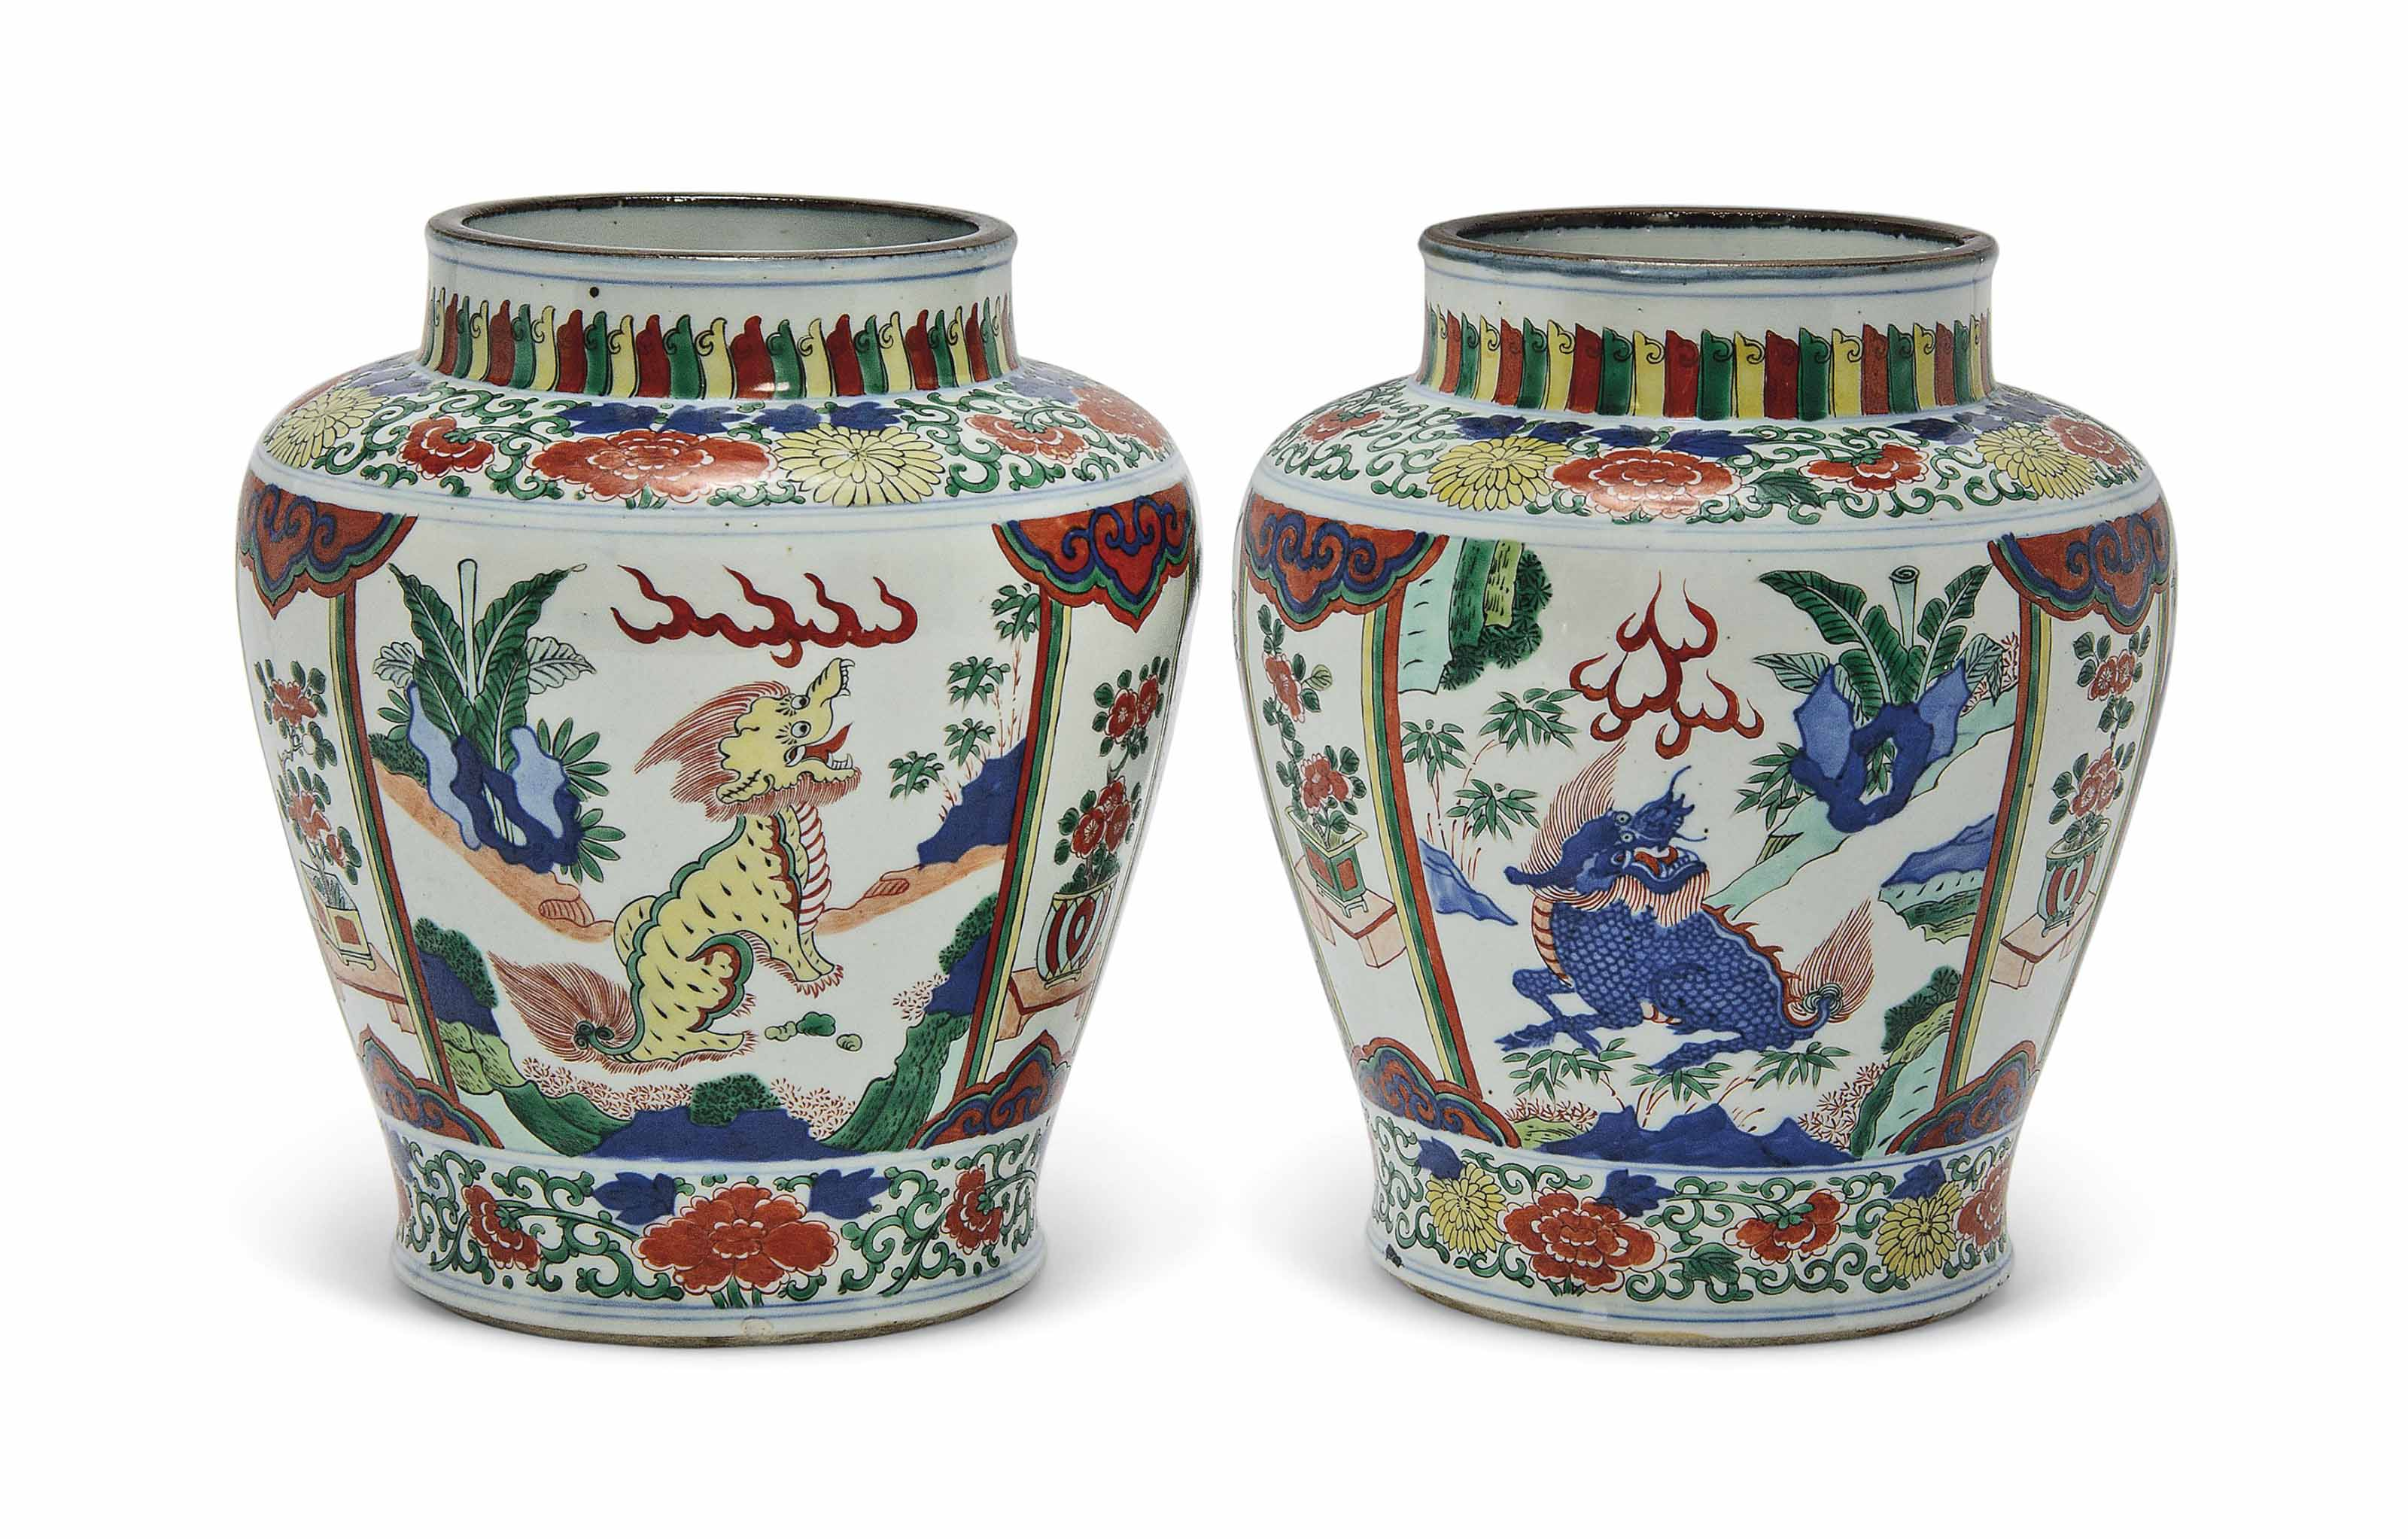 A PAIR OF CHINESE WUCAI JARS